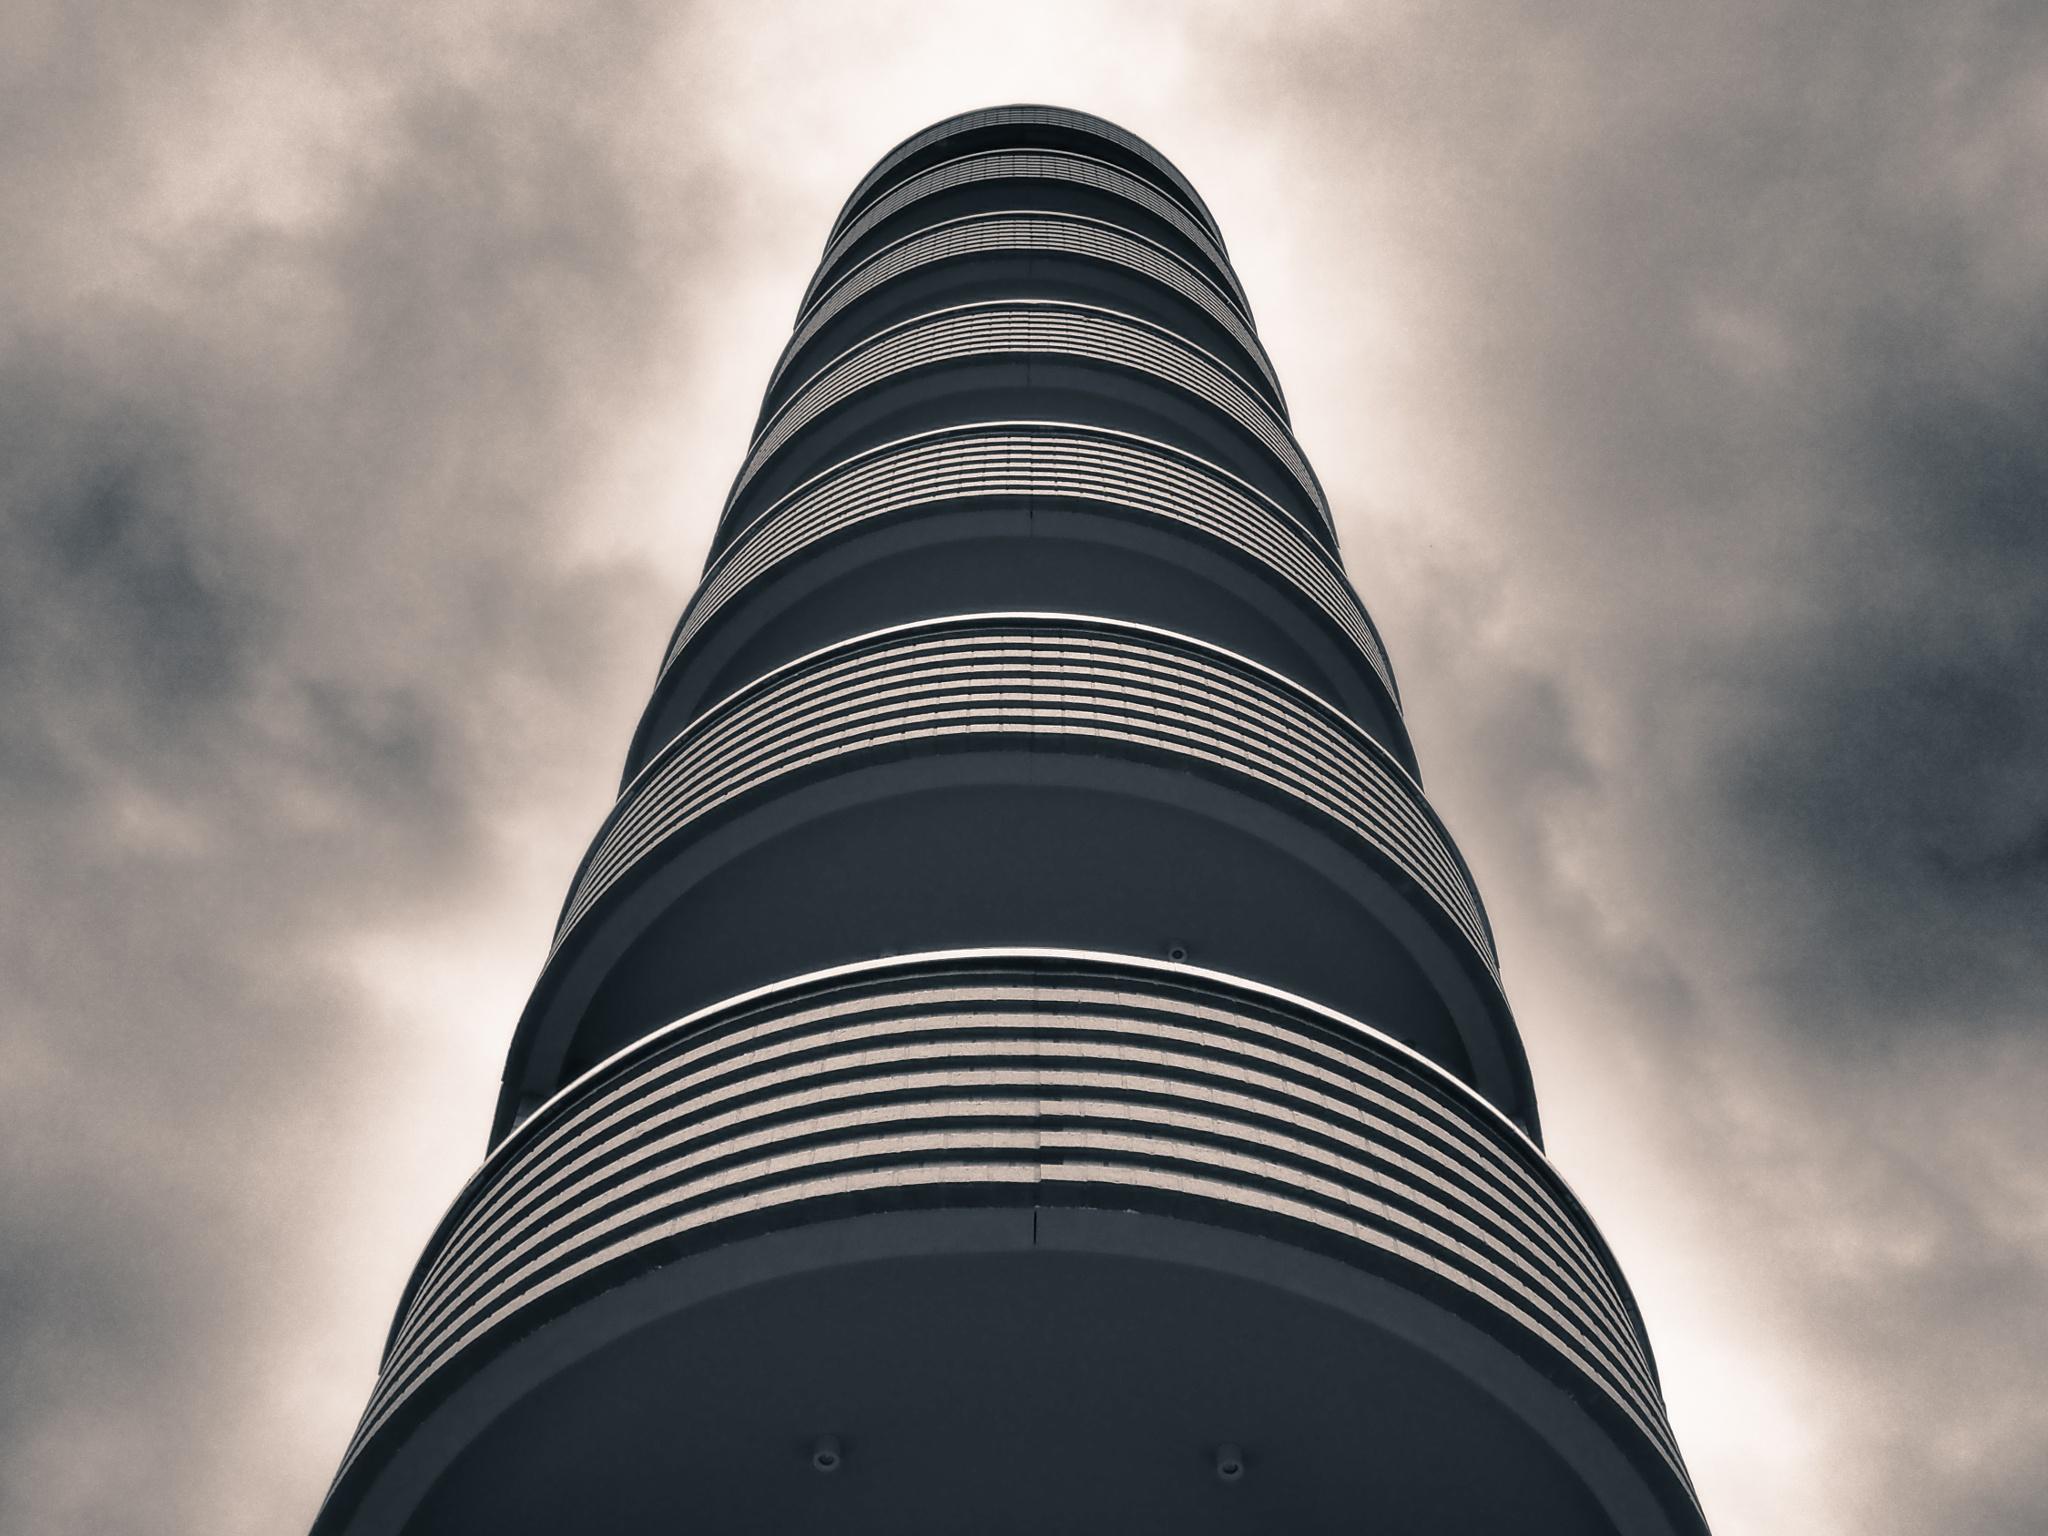 Berlin Hotel Black & White by Jeans Brown Photography / Jens Schwarz